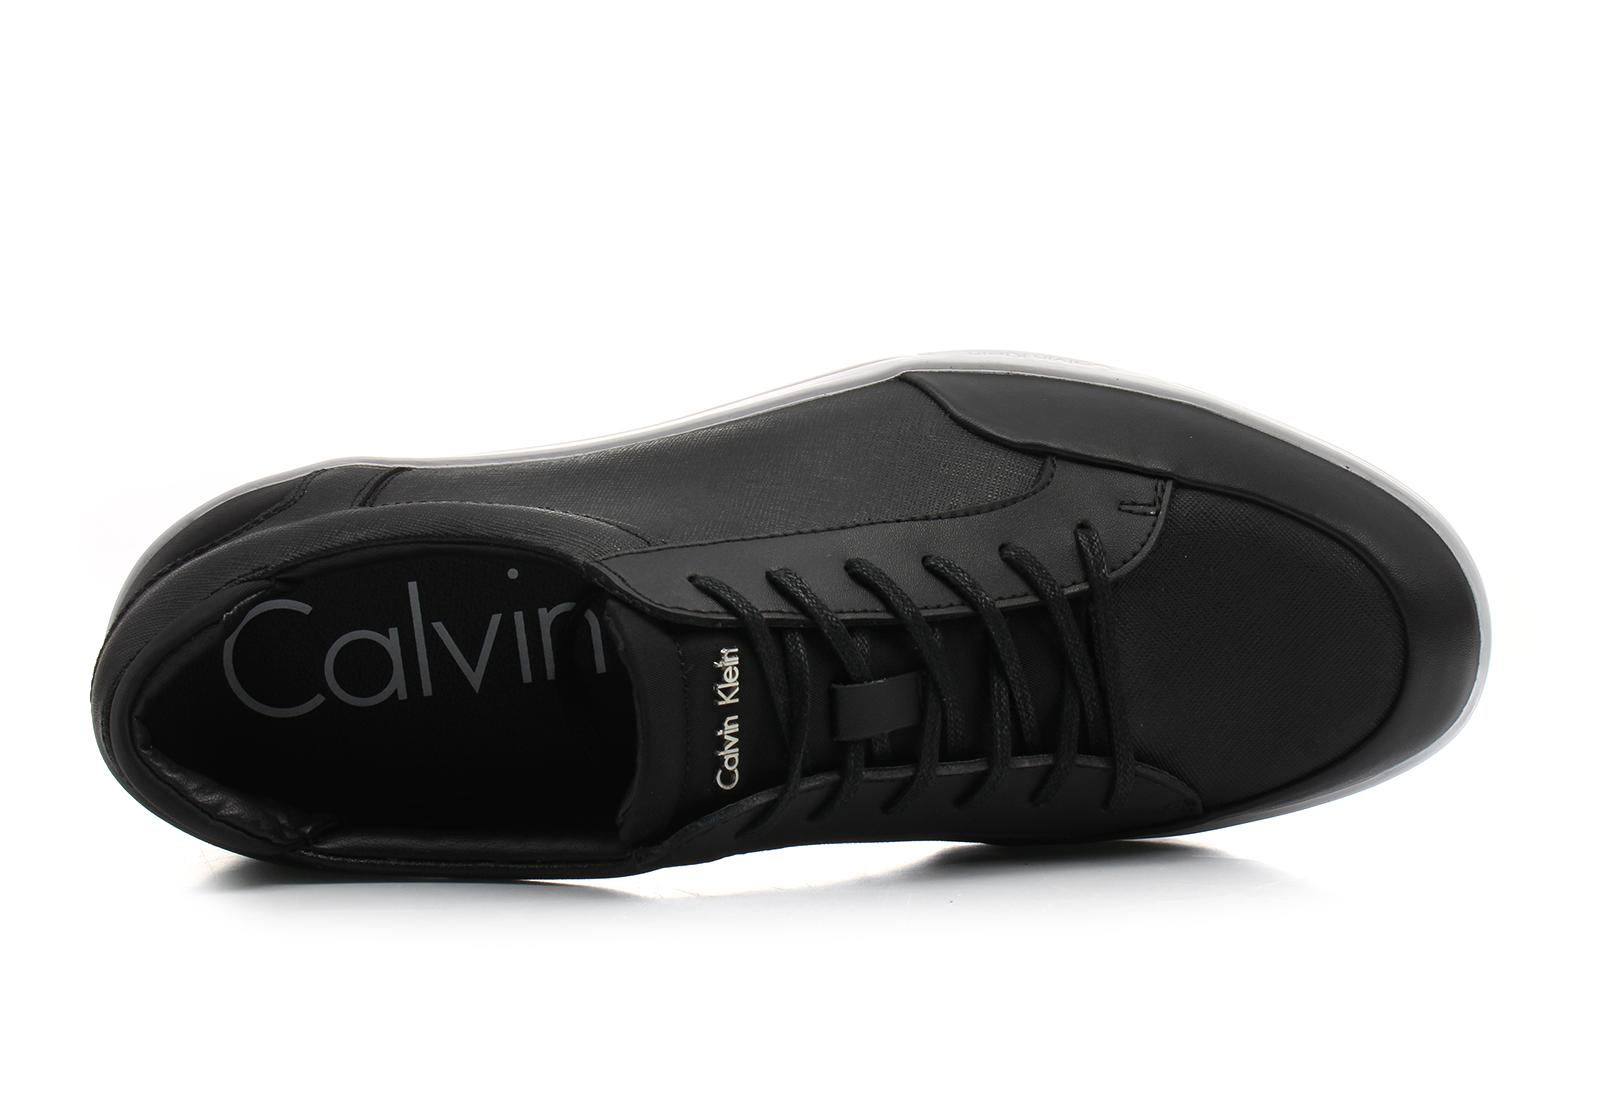 35438105e9 Calvin Klein Black Label Topánky - Balin - F1854-BLK - Tenisky ...